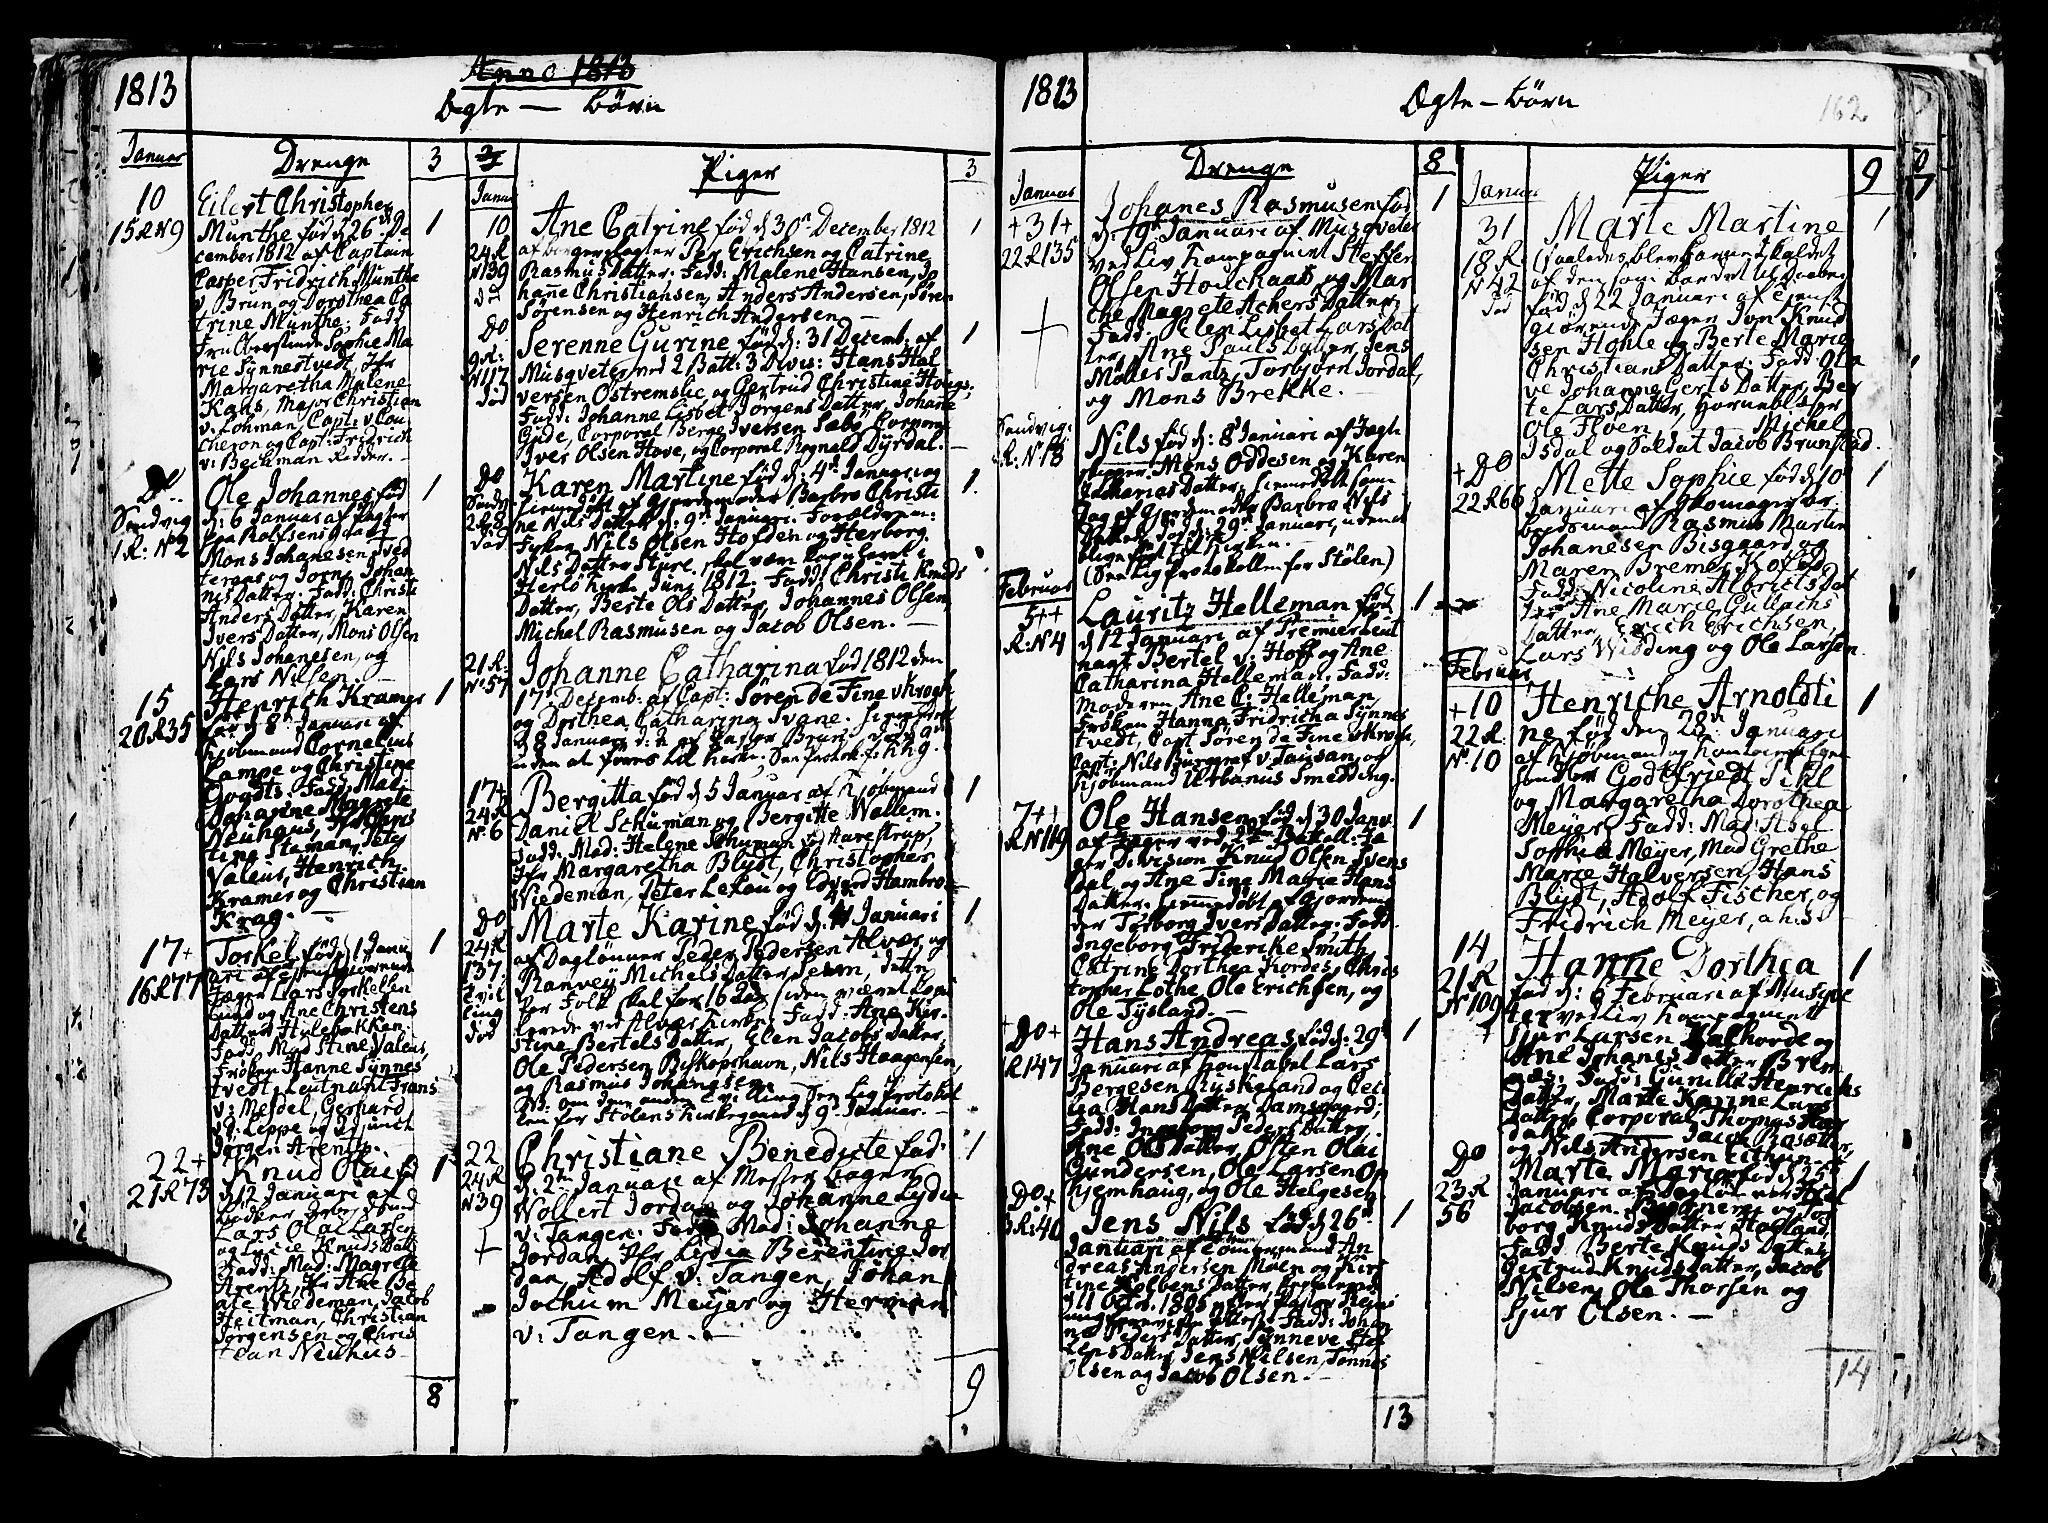 SAB, Korskirken Sokneprestembete, H/Haa/L0006: Ministerialbok nr. A 6, 1790-1820, s. 162